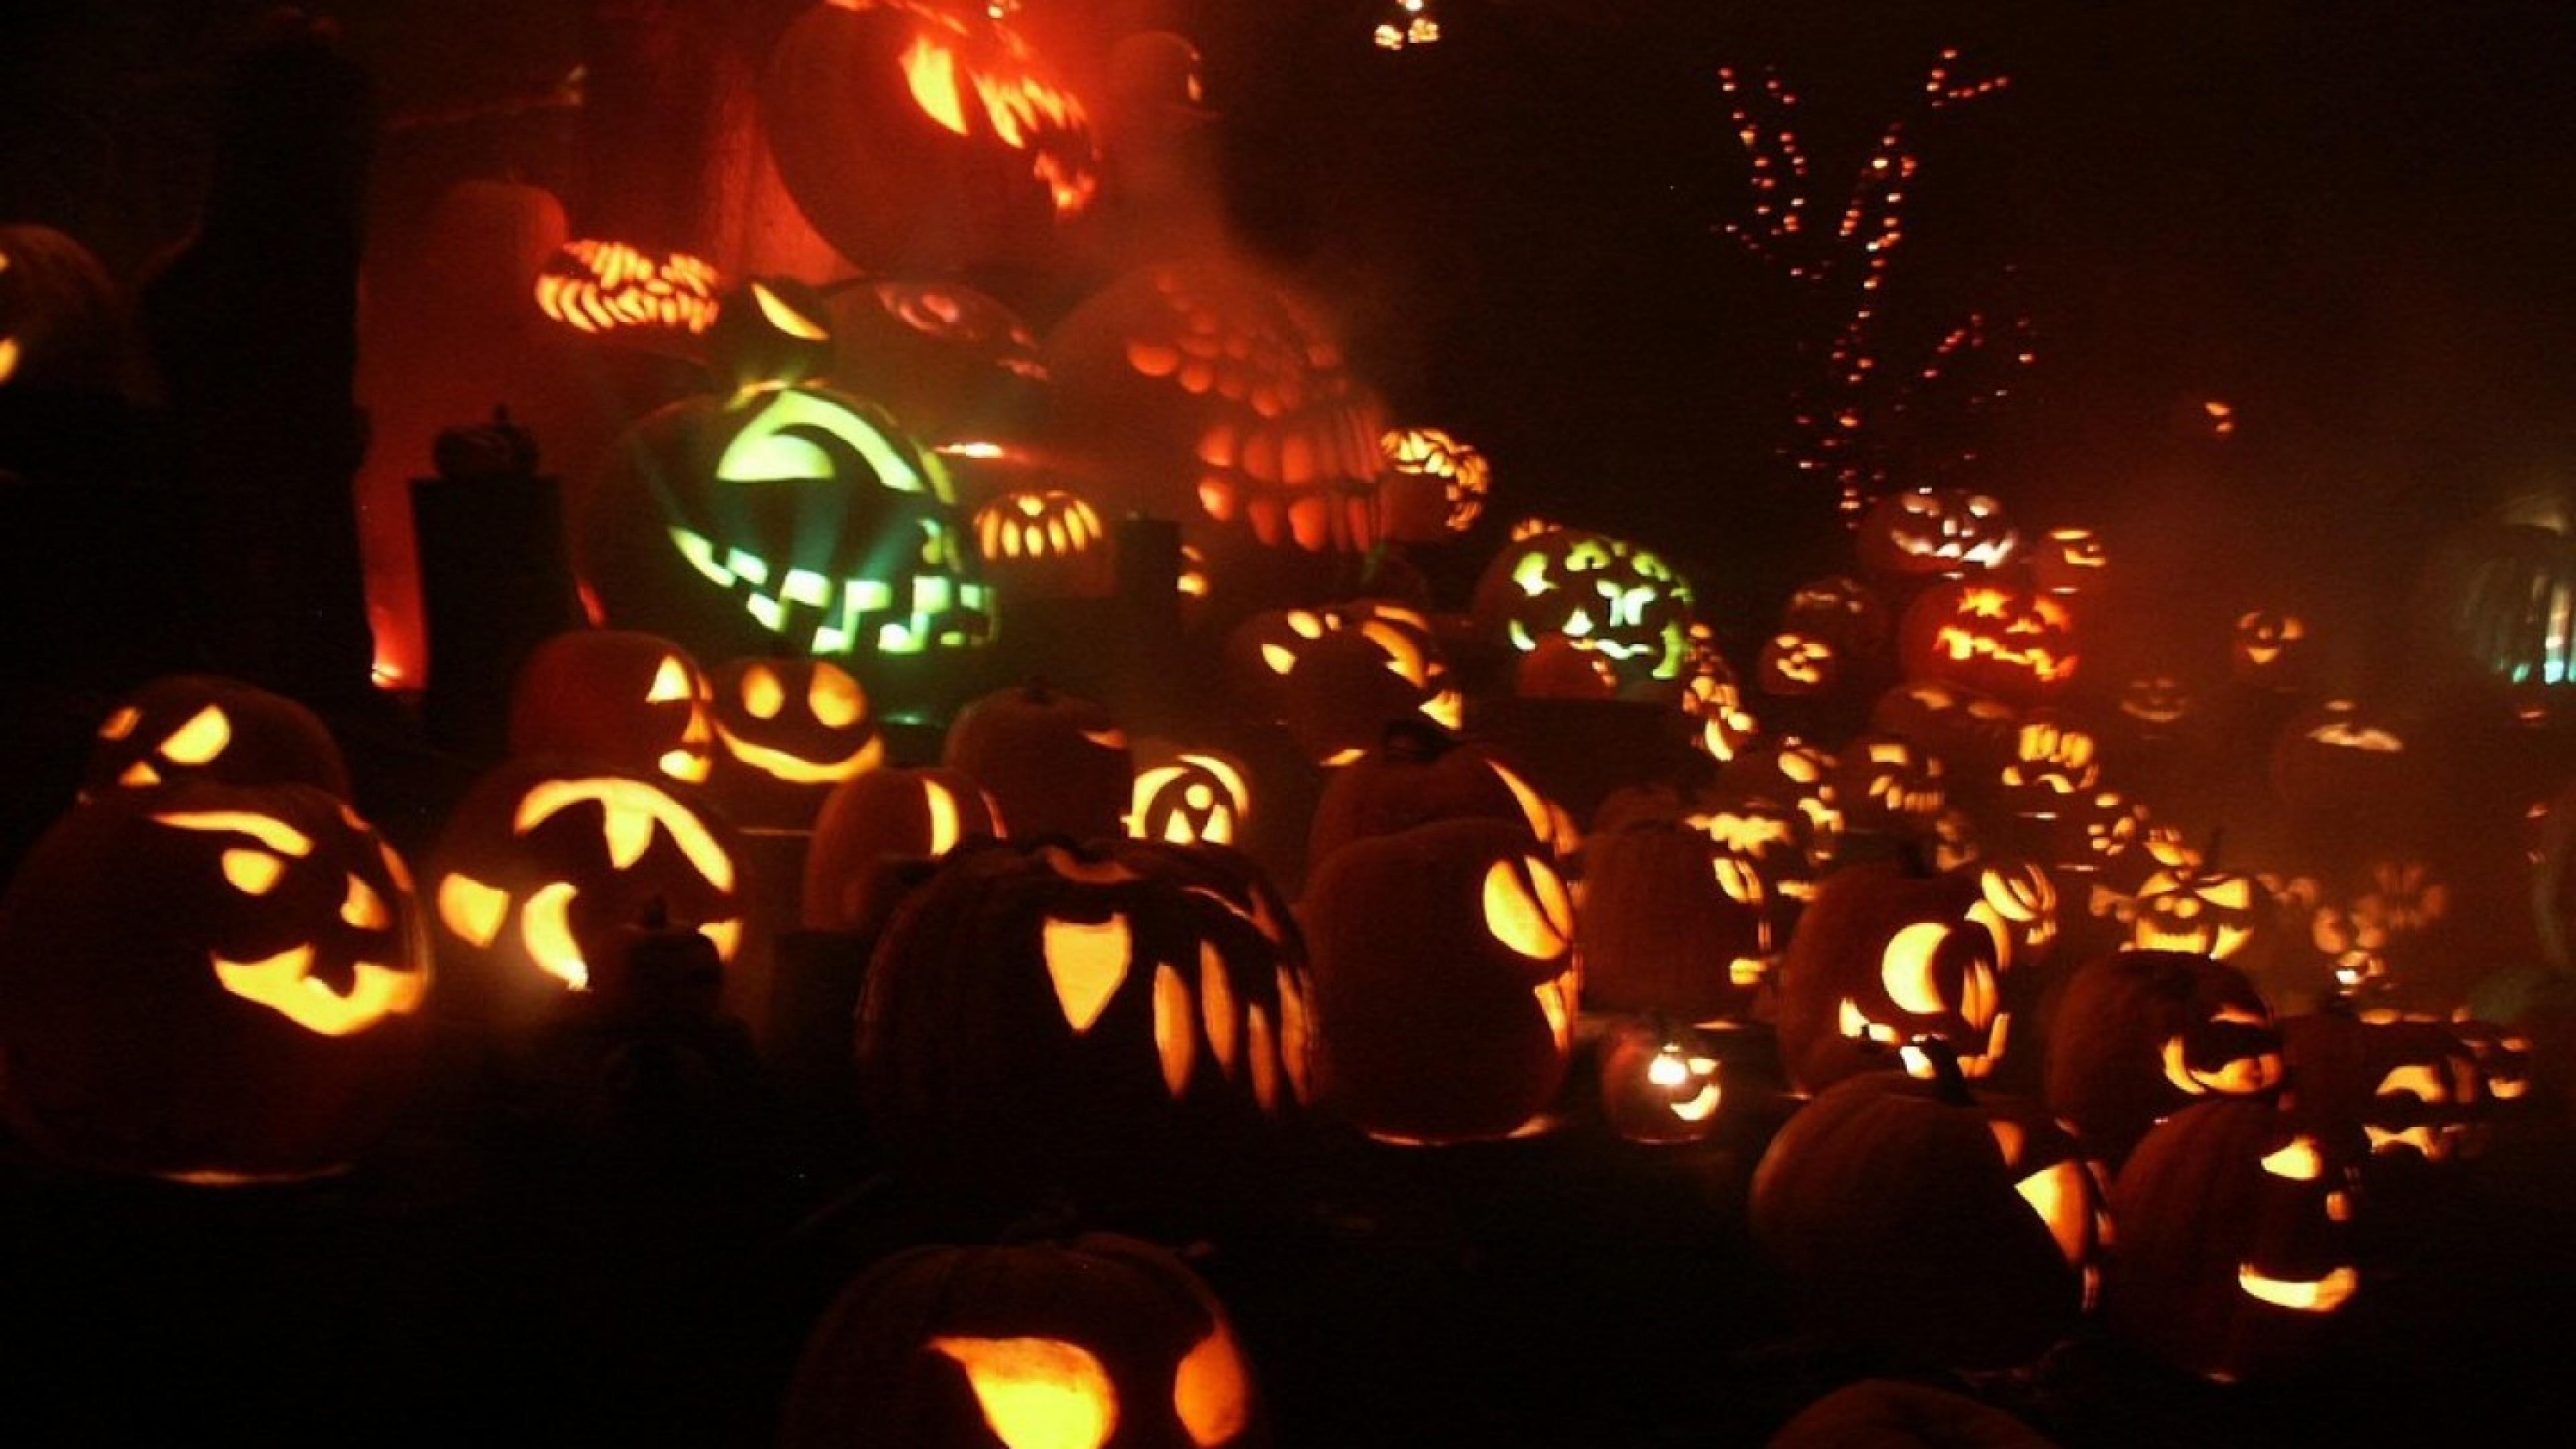 Pumpkins Jack O Lanterns Hd Wallpaper Wallpapers Trend